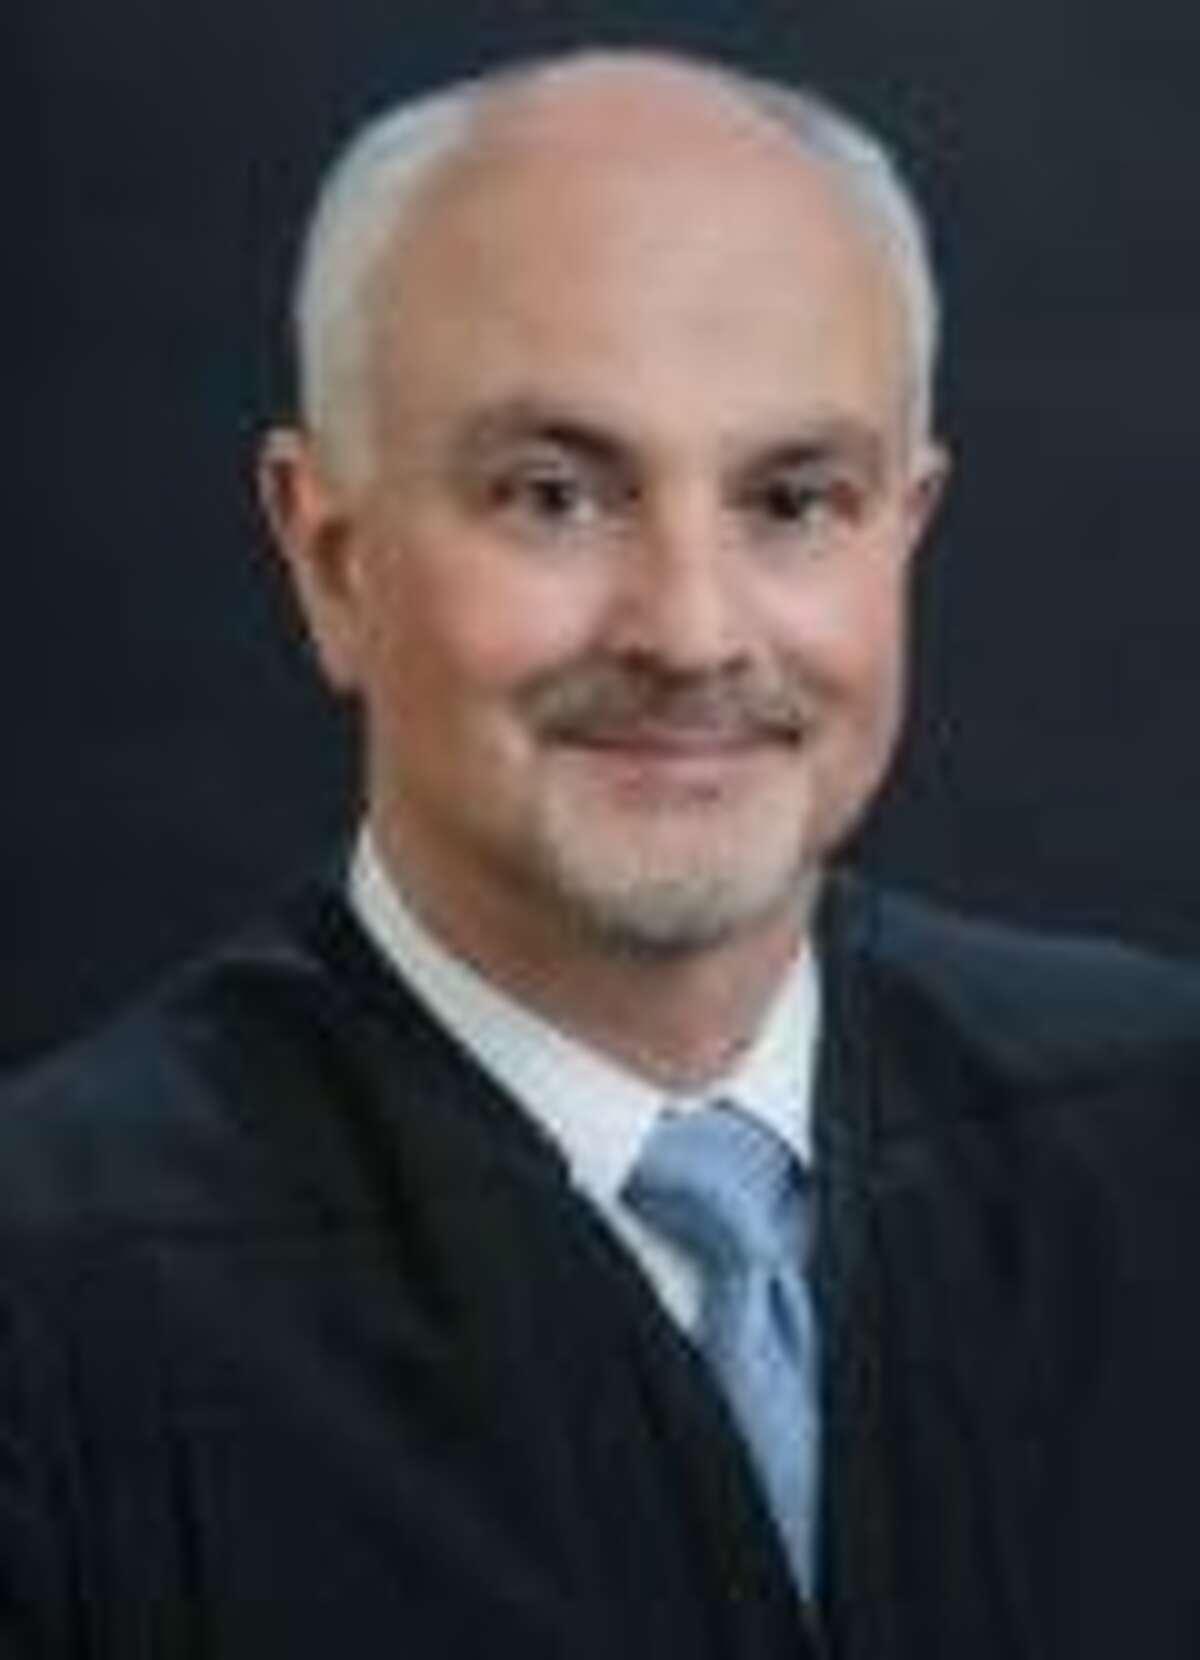 U.S. District Judge James Donato